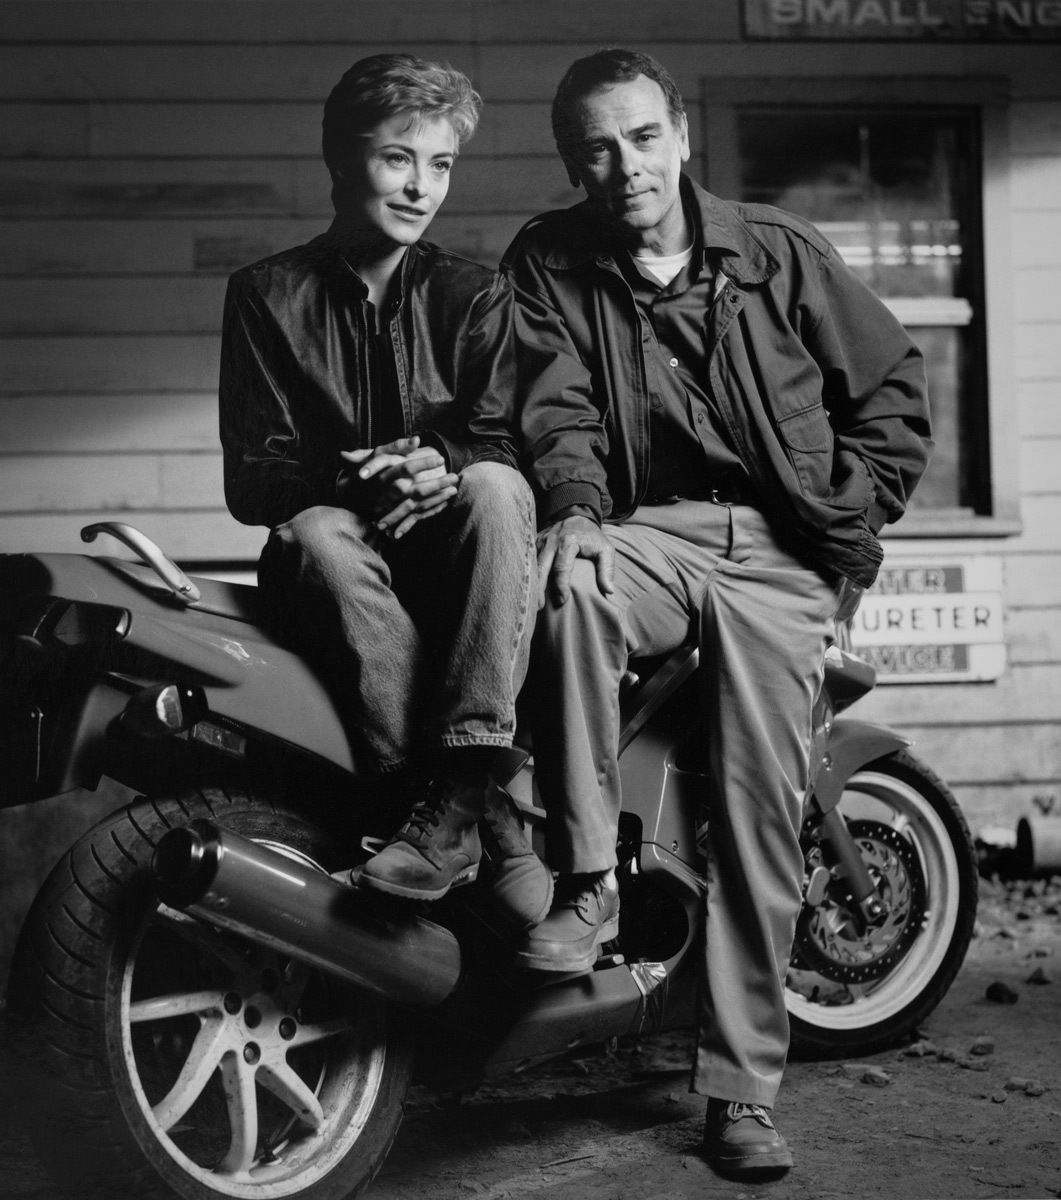 Amanda Donohoe & Dean Stockwell